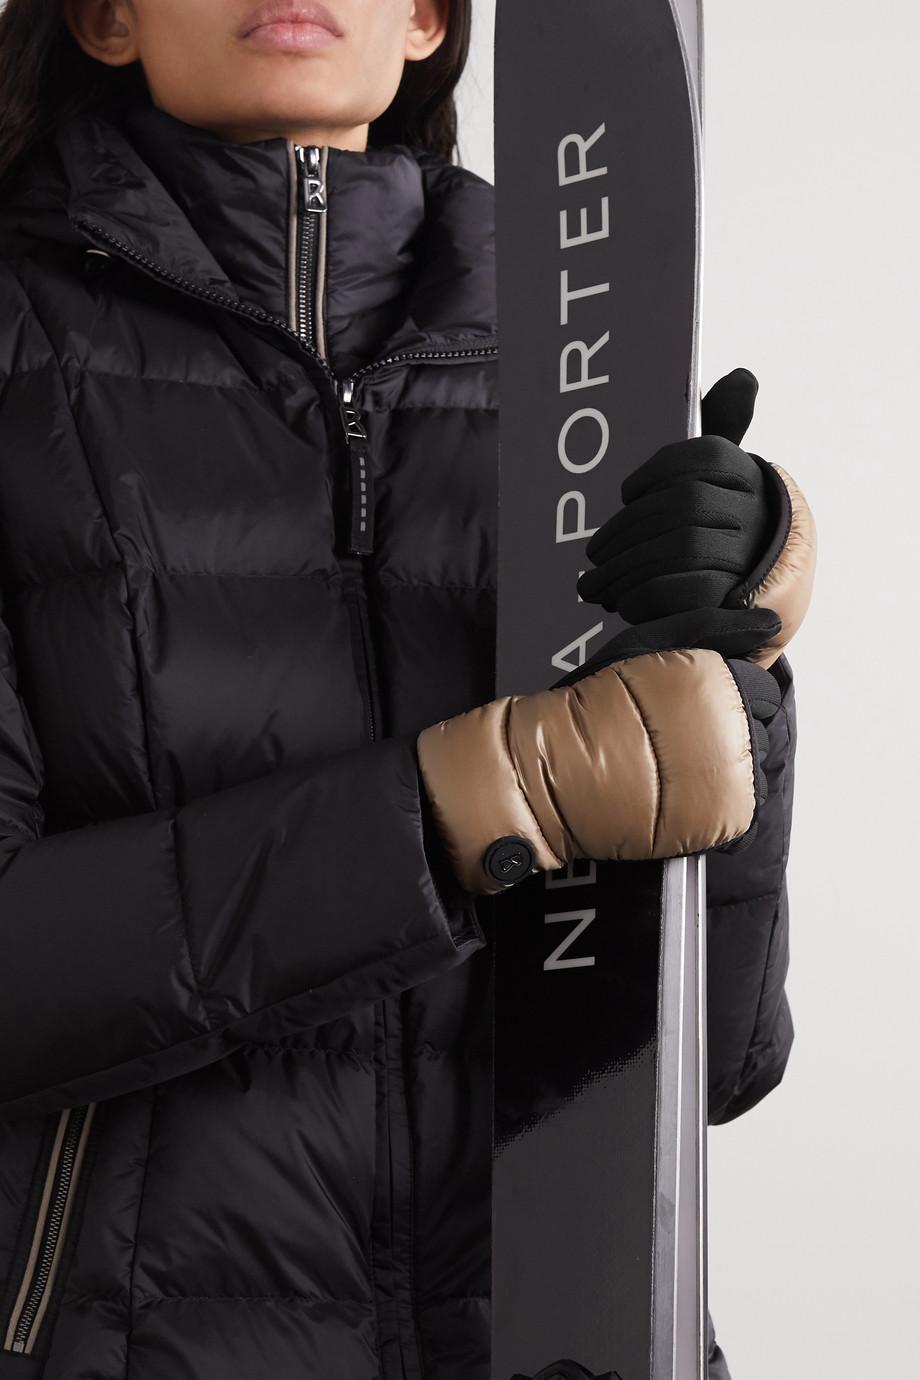 Bogner Touch Handschuhe aus gestepptem Shell und Stretch-Jersey